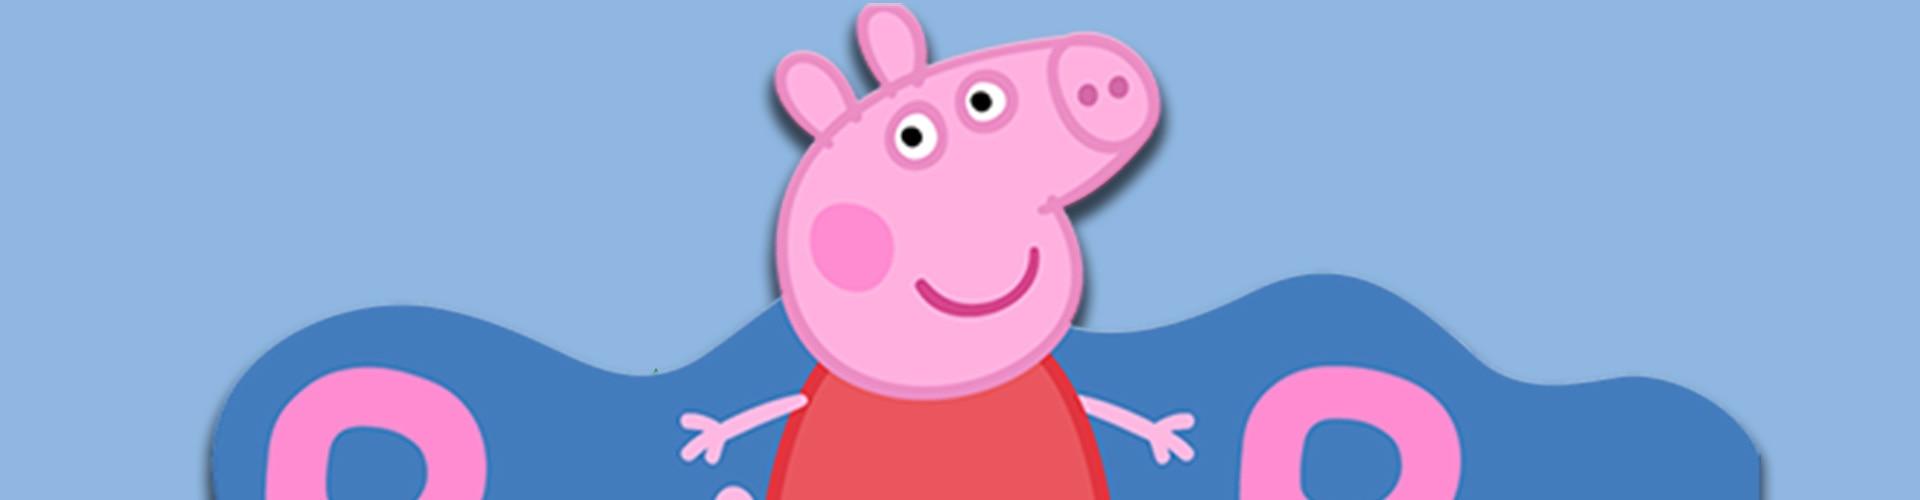 Watch Peppa Pig Online